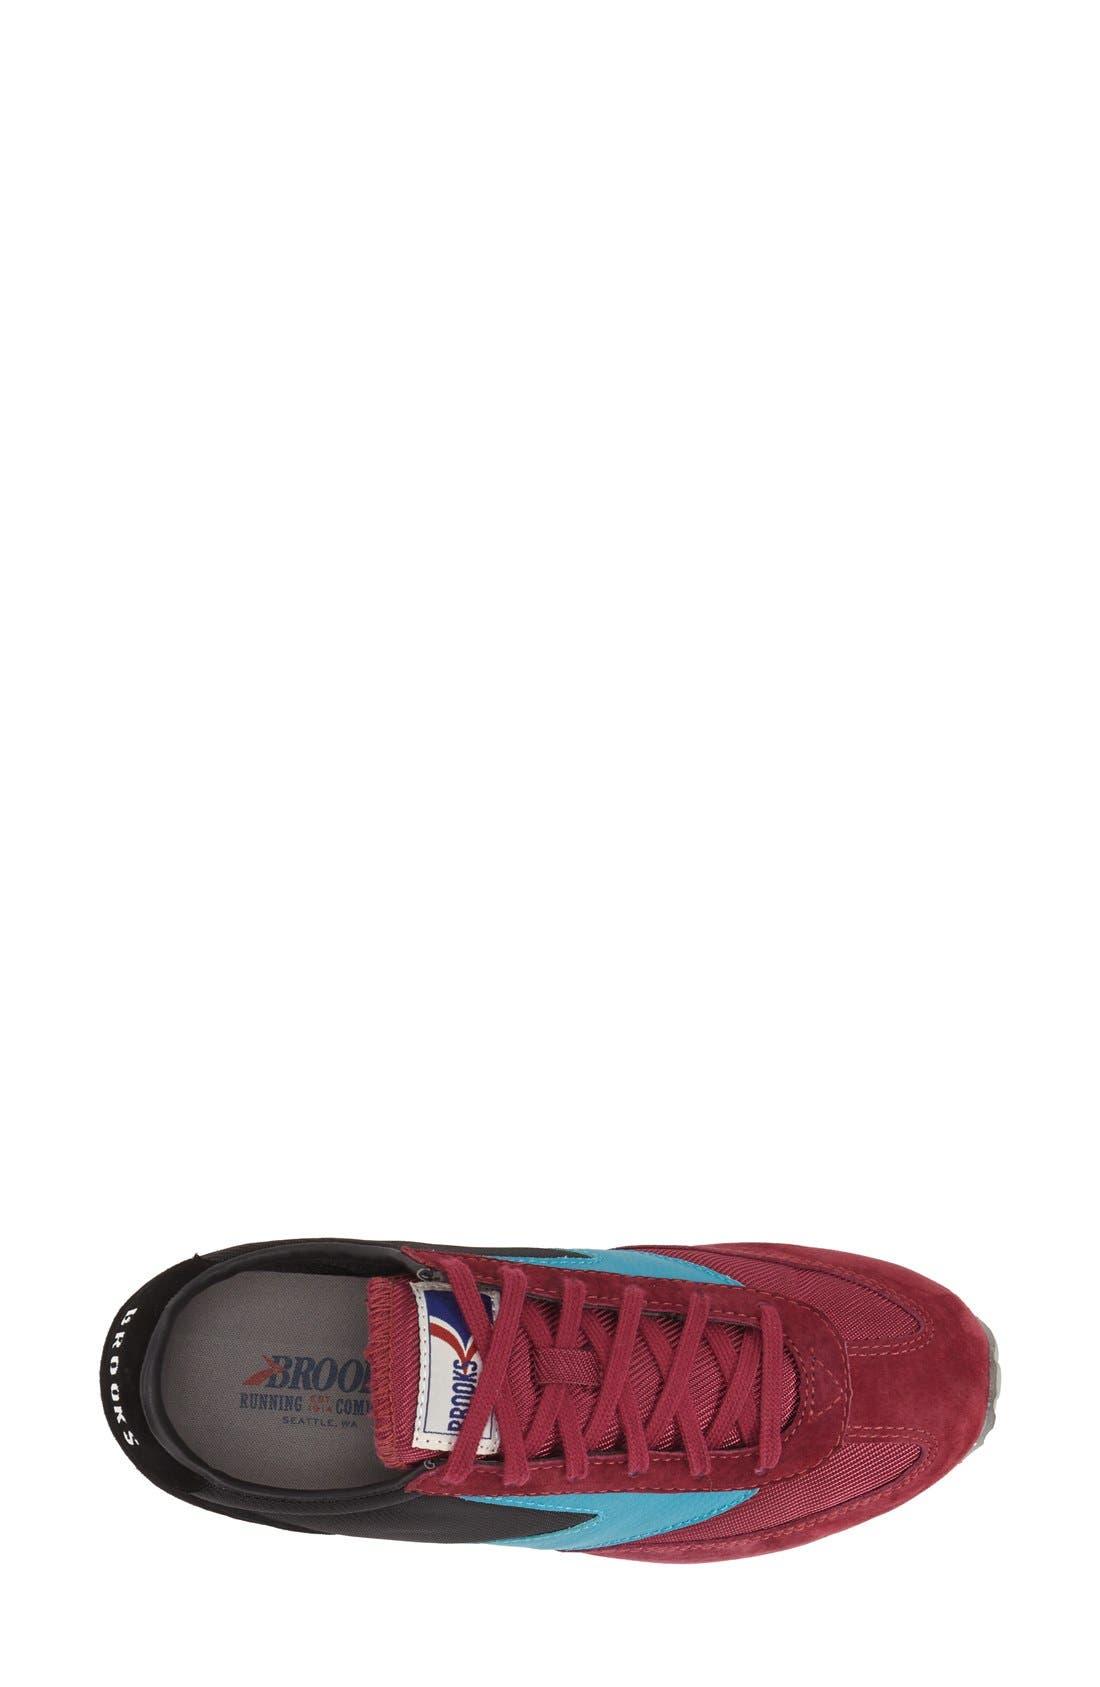 'Vanguard' Sneaker,                             Alternate thumbnail 53, color,